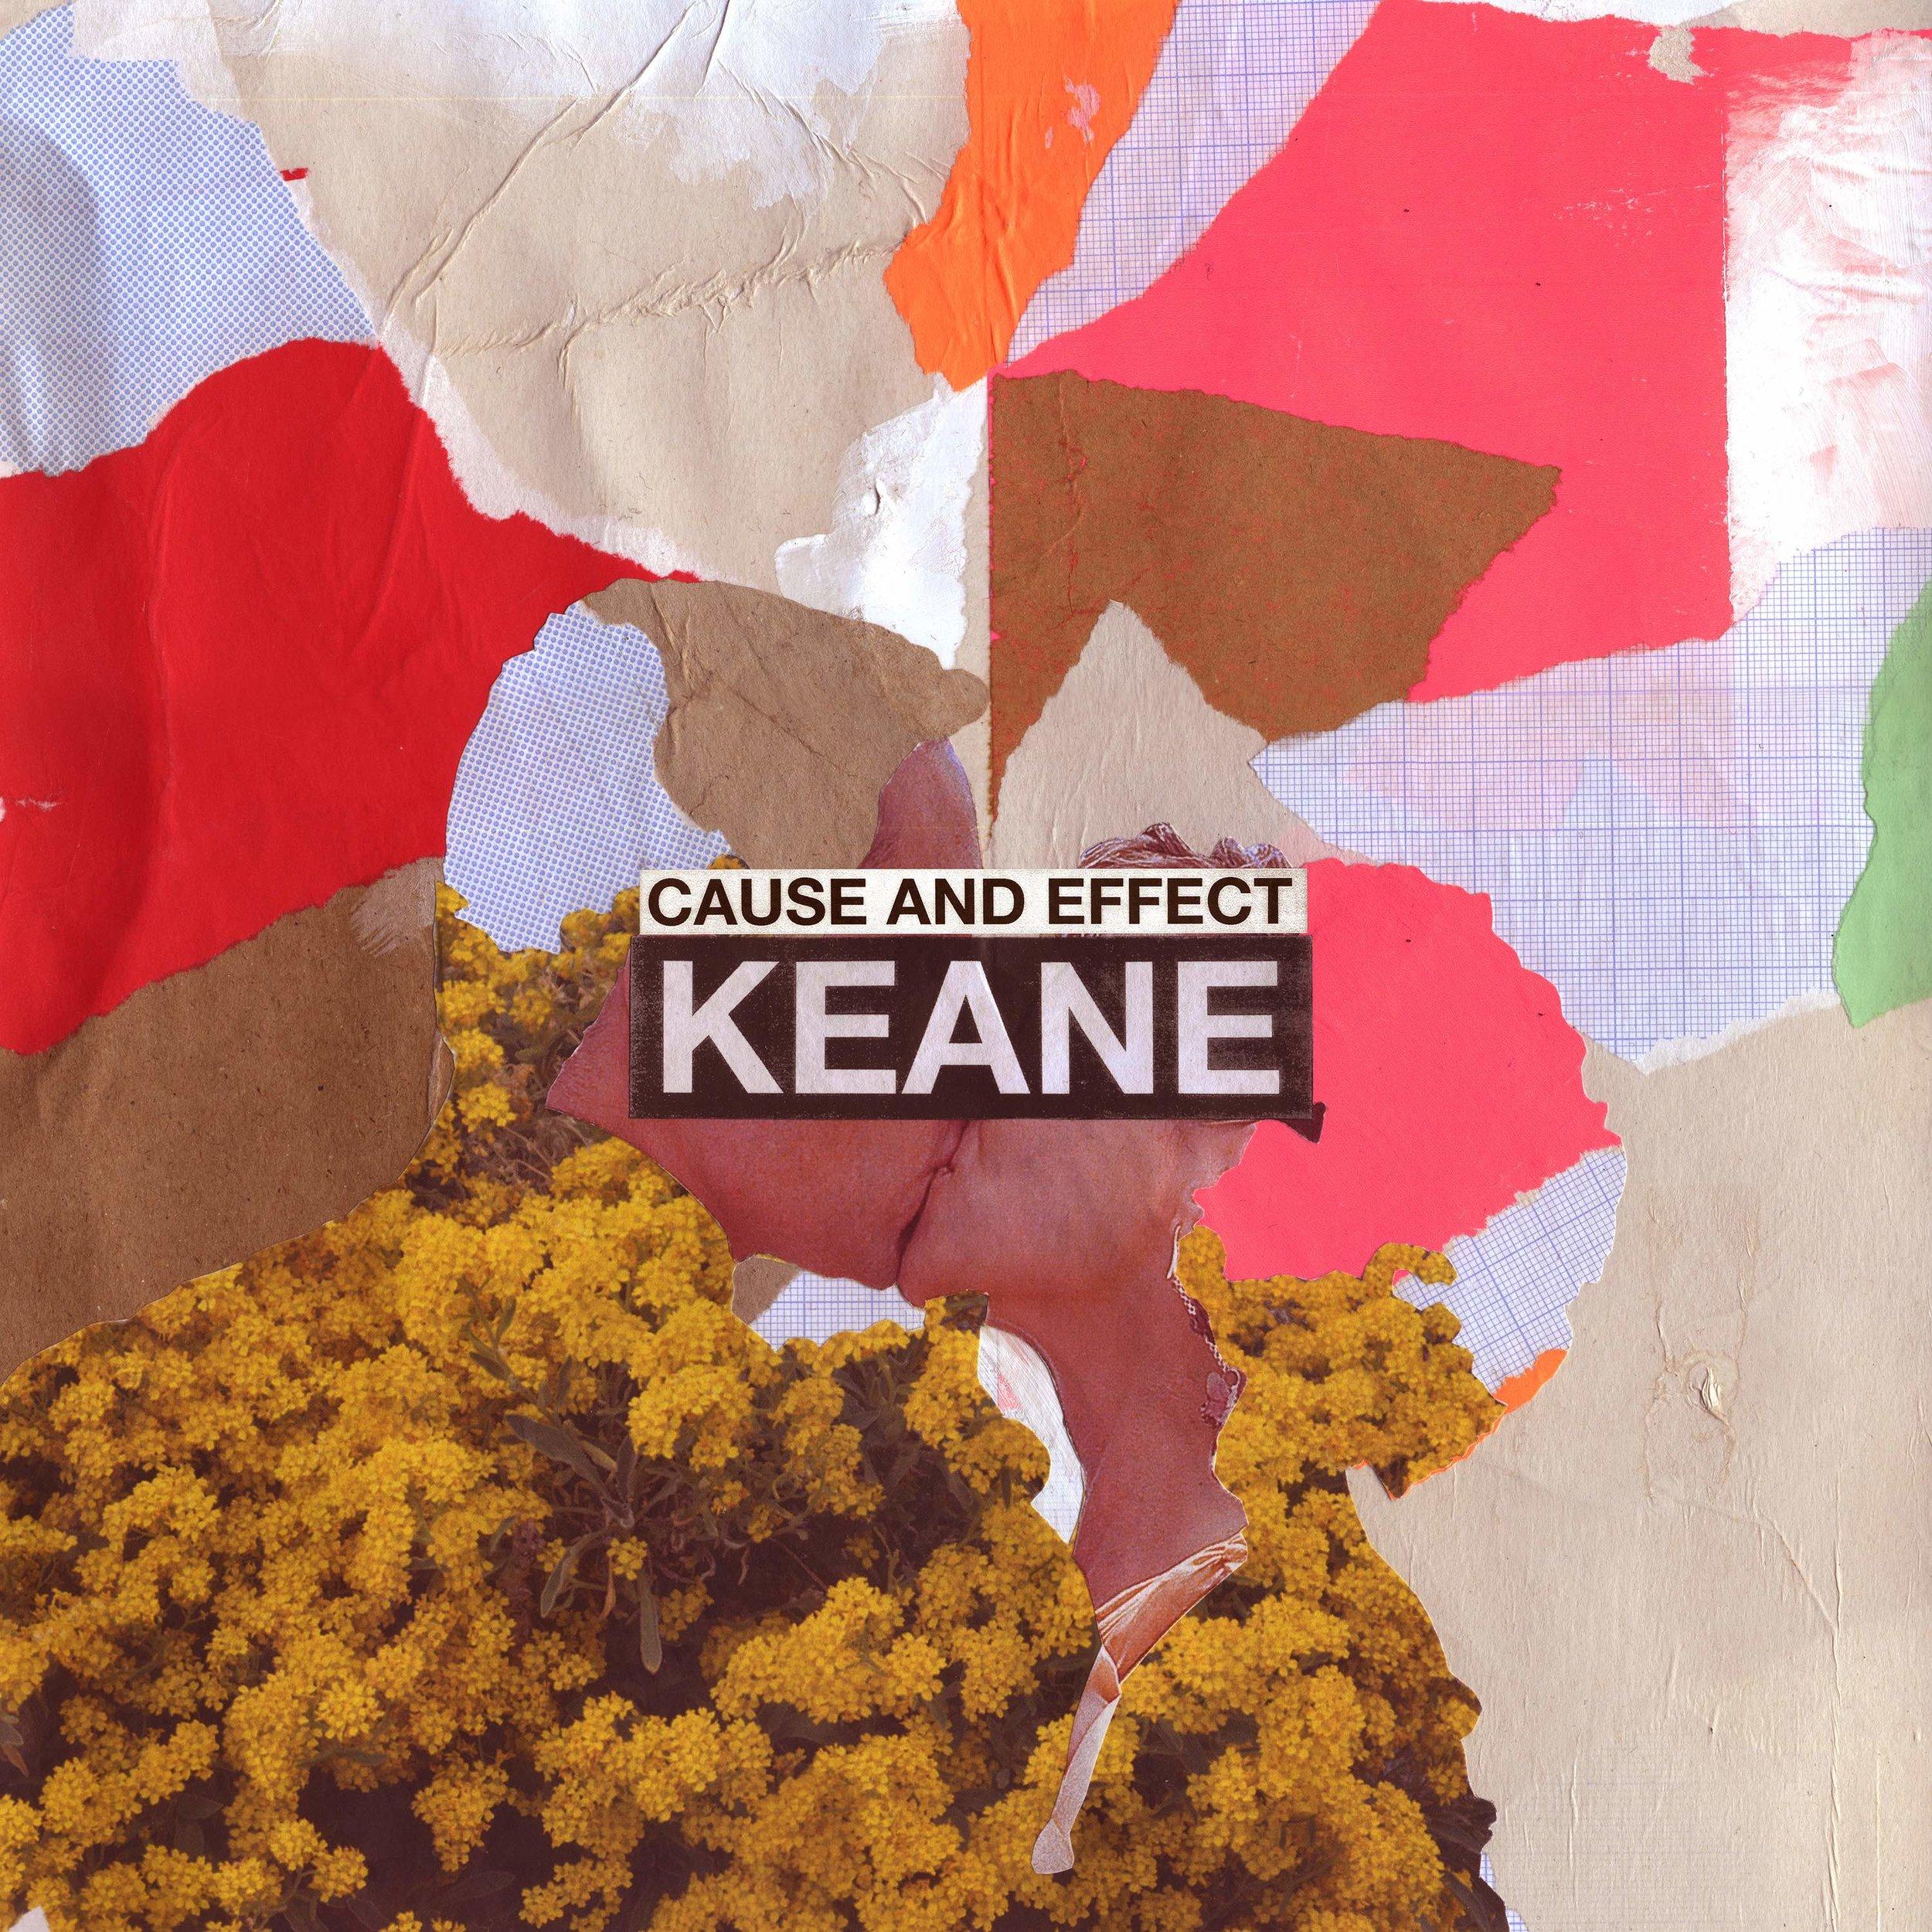 KEANE_CAUSEANDEFF_COVER_A_02.jpg